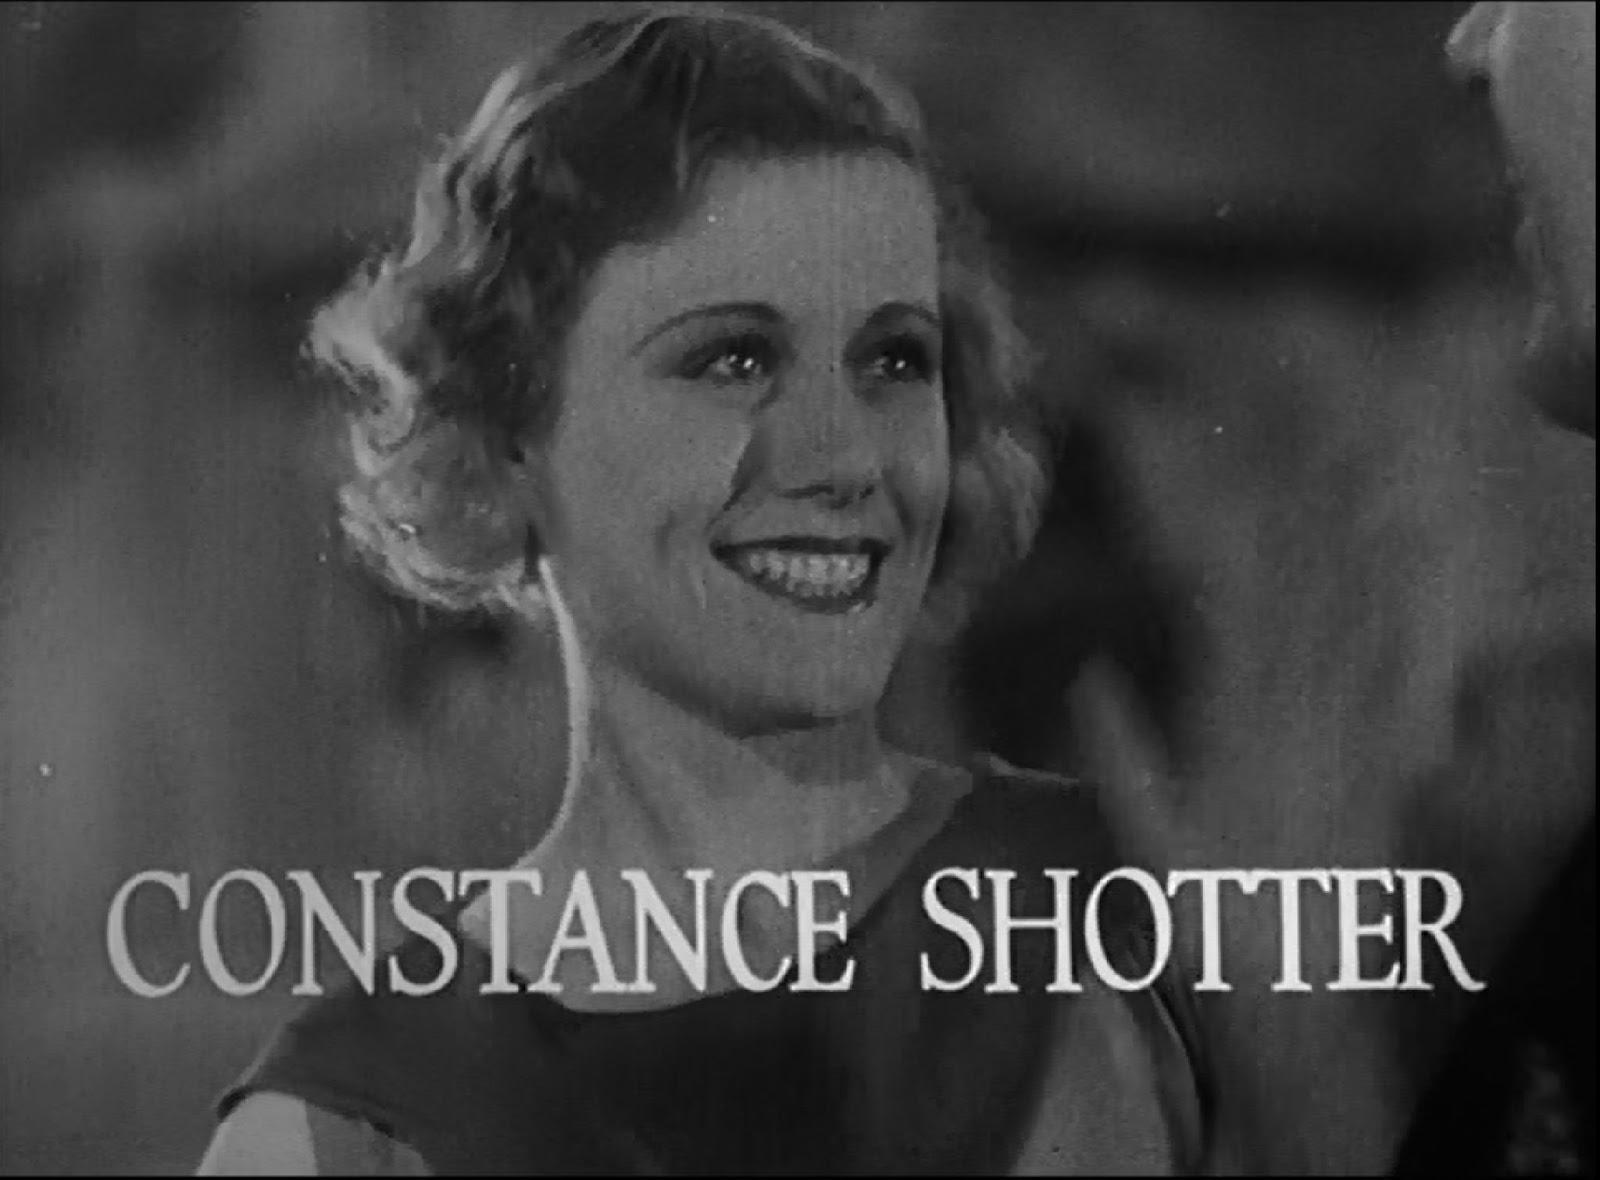 Constance Shotter